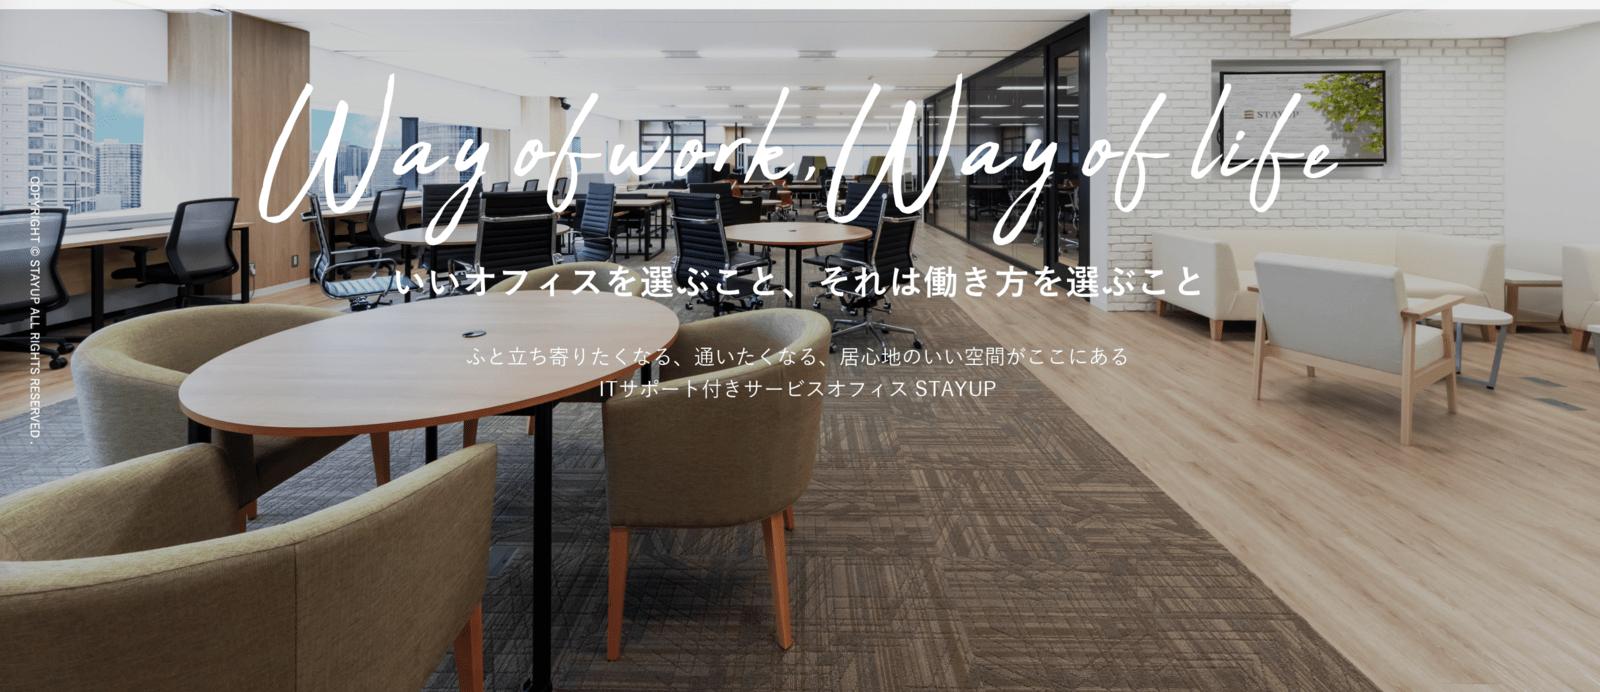 STAYUP横浜・コワーキングスペース・シェアオフィス